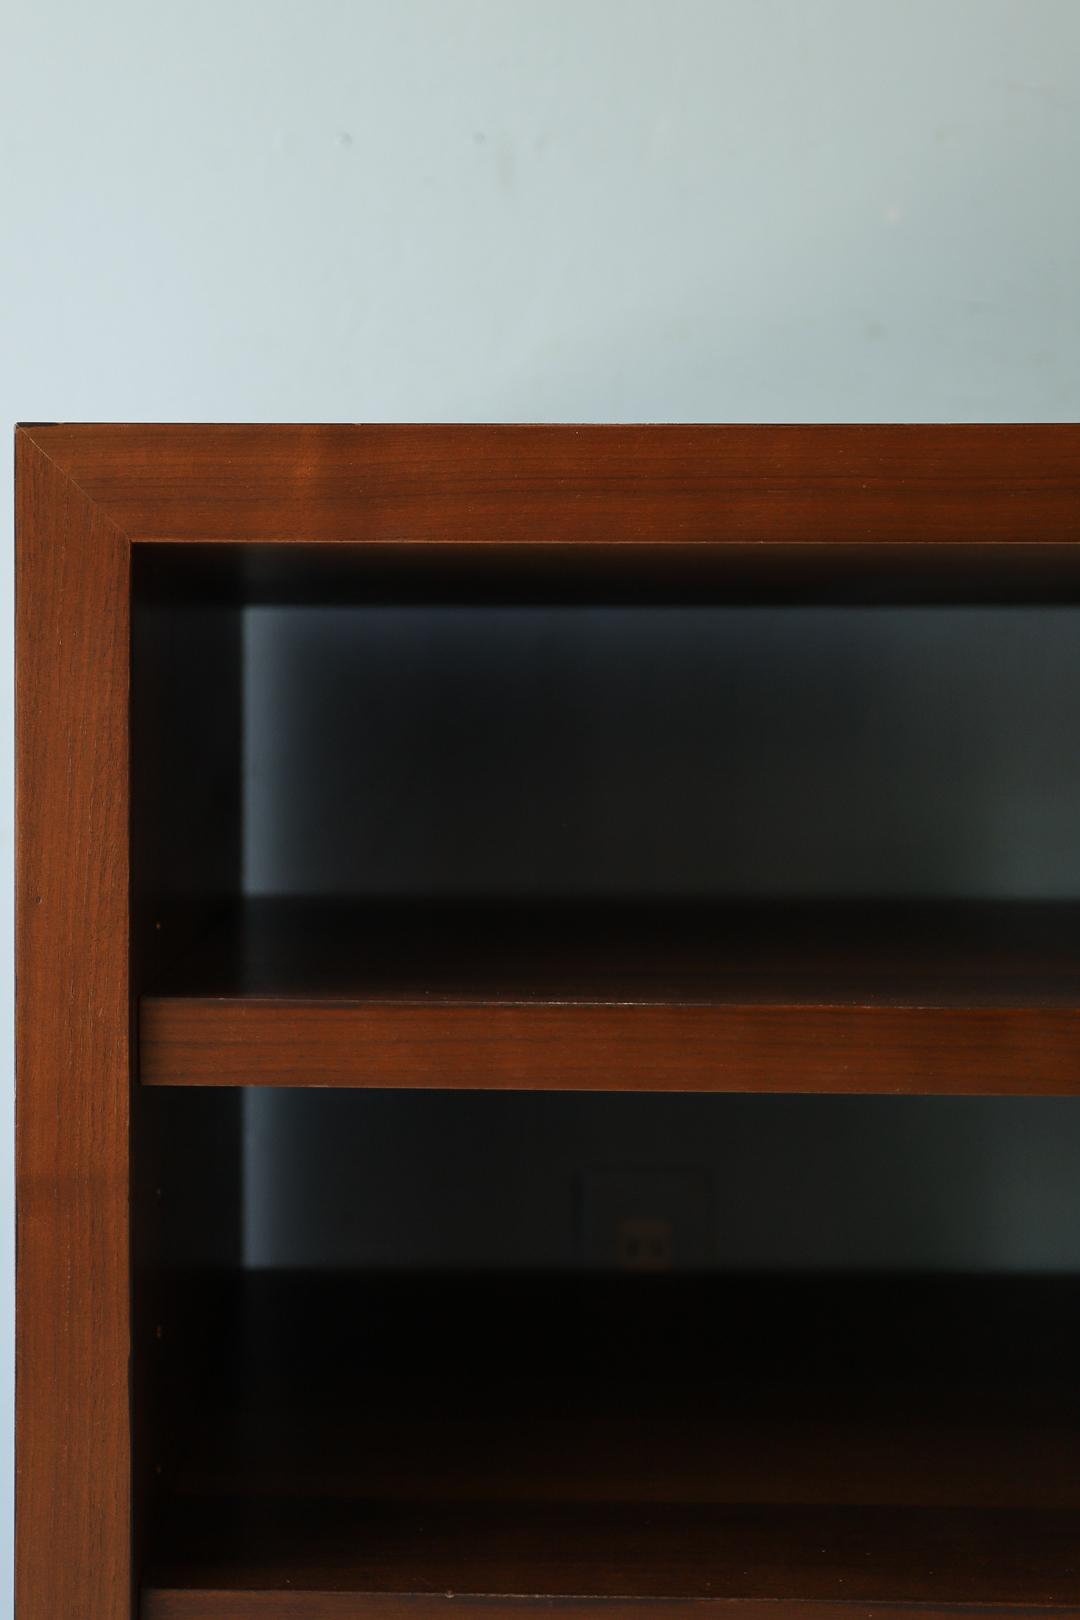 Wooden Audio Rack Simple Modern Design/オーディオラック 木製 シンプル モダン キャビネット 収納家具